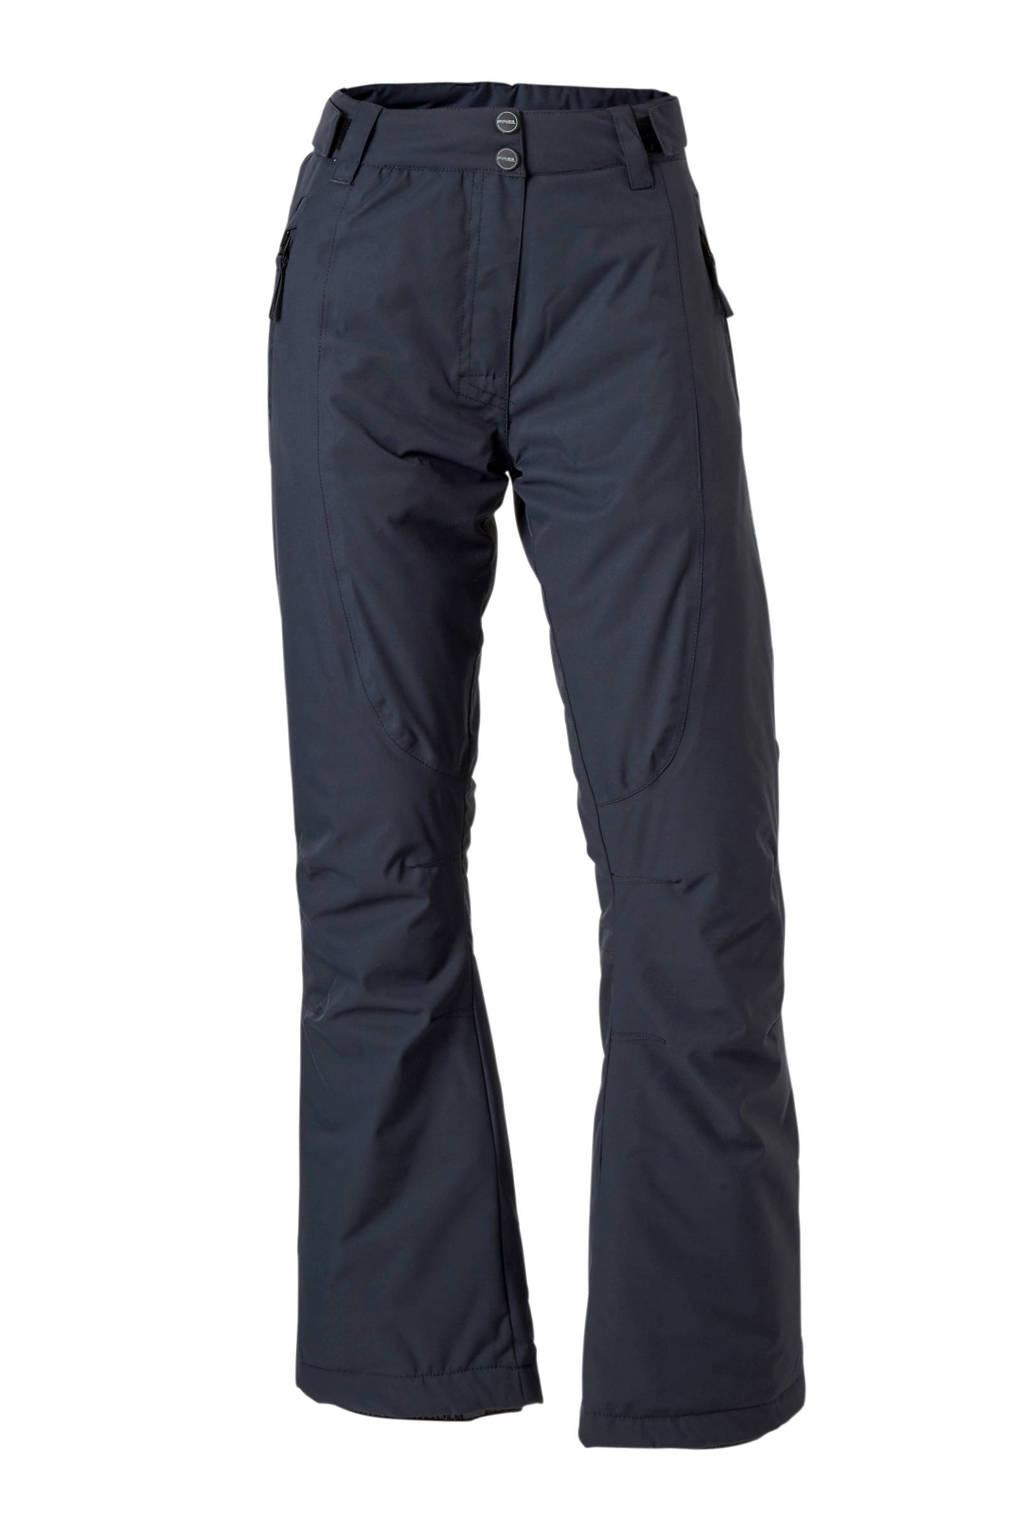 Rehall skibroek Milly-R, Marineblauw